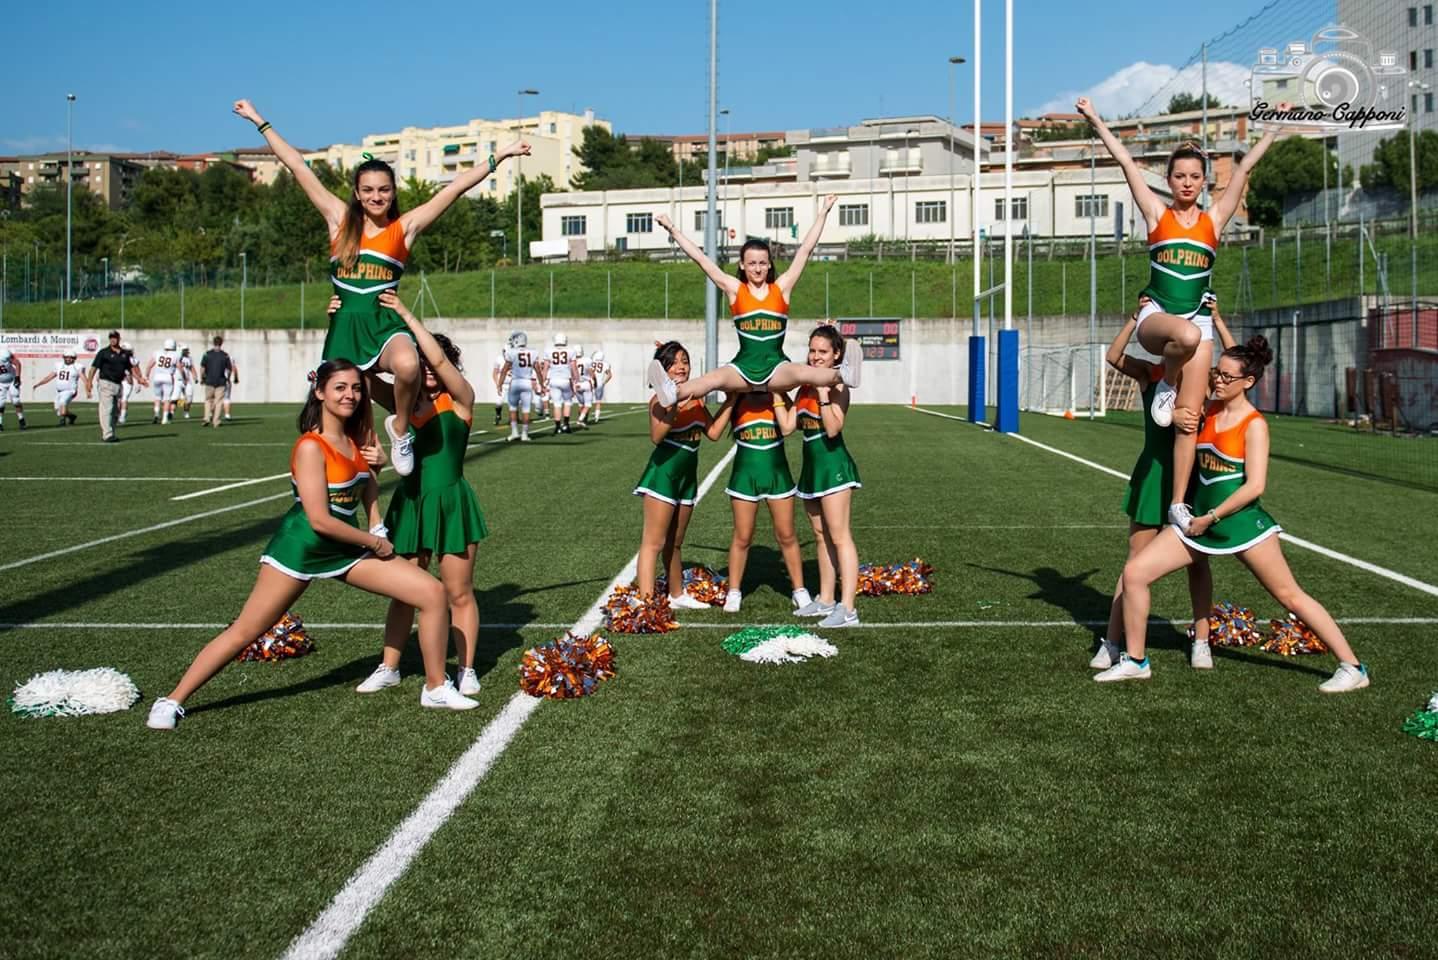 Cheerleaders - Cus Ancona